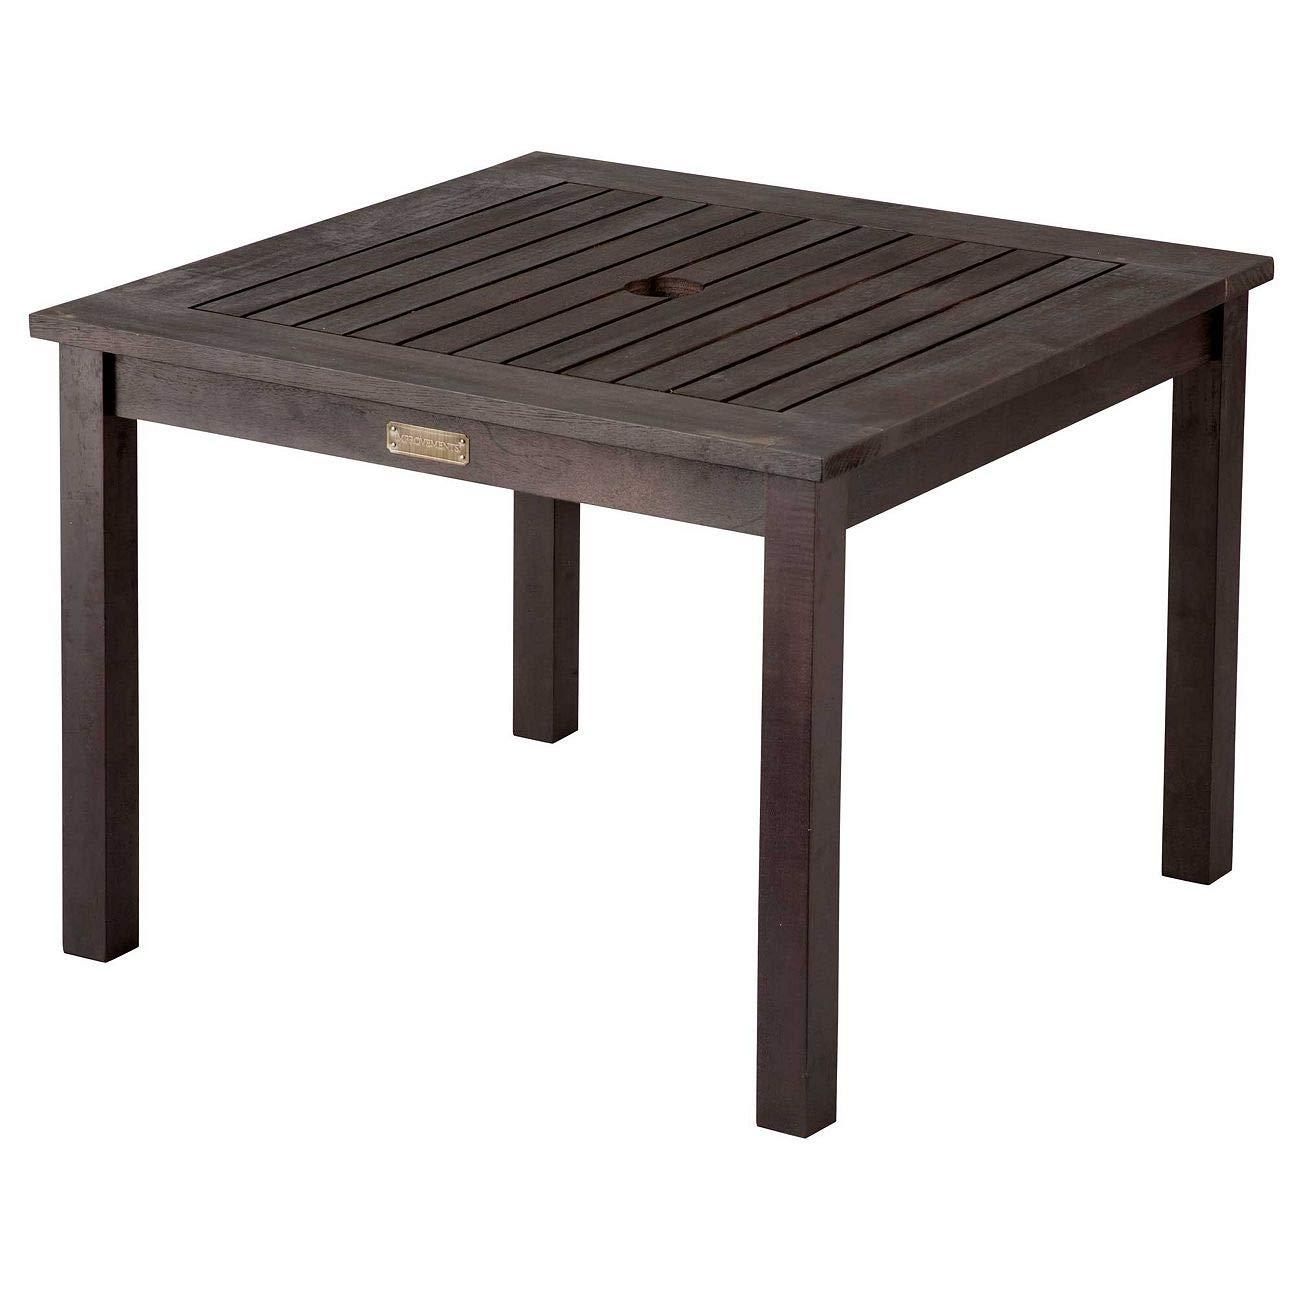 Amazon com outdoor rustic espresso finish eucalyptus wood umbrella side table end table patio pool furniture garden outdoor